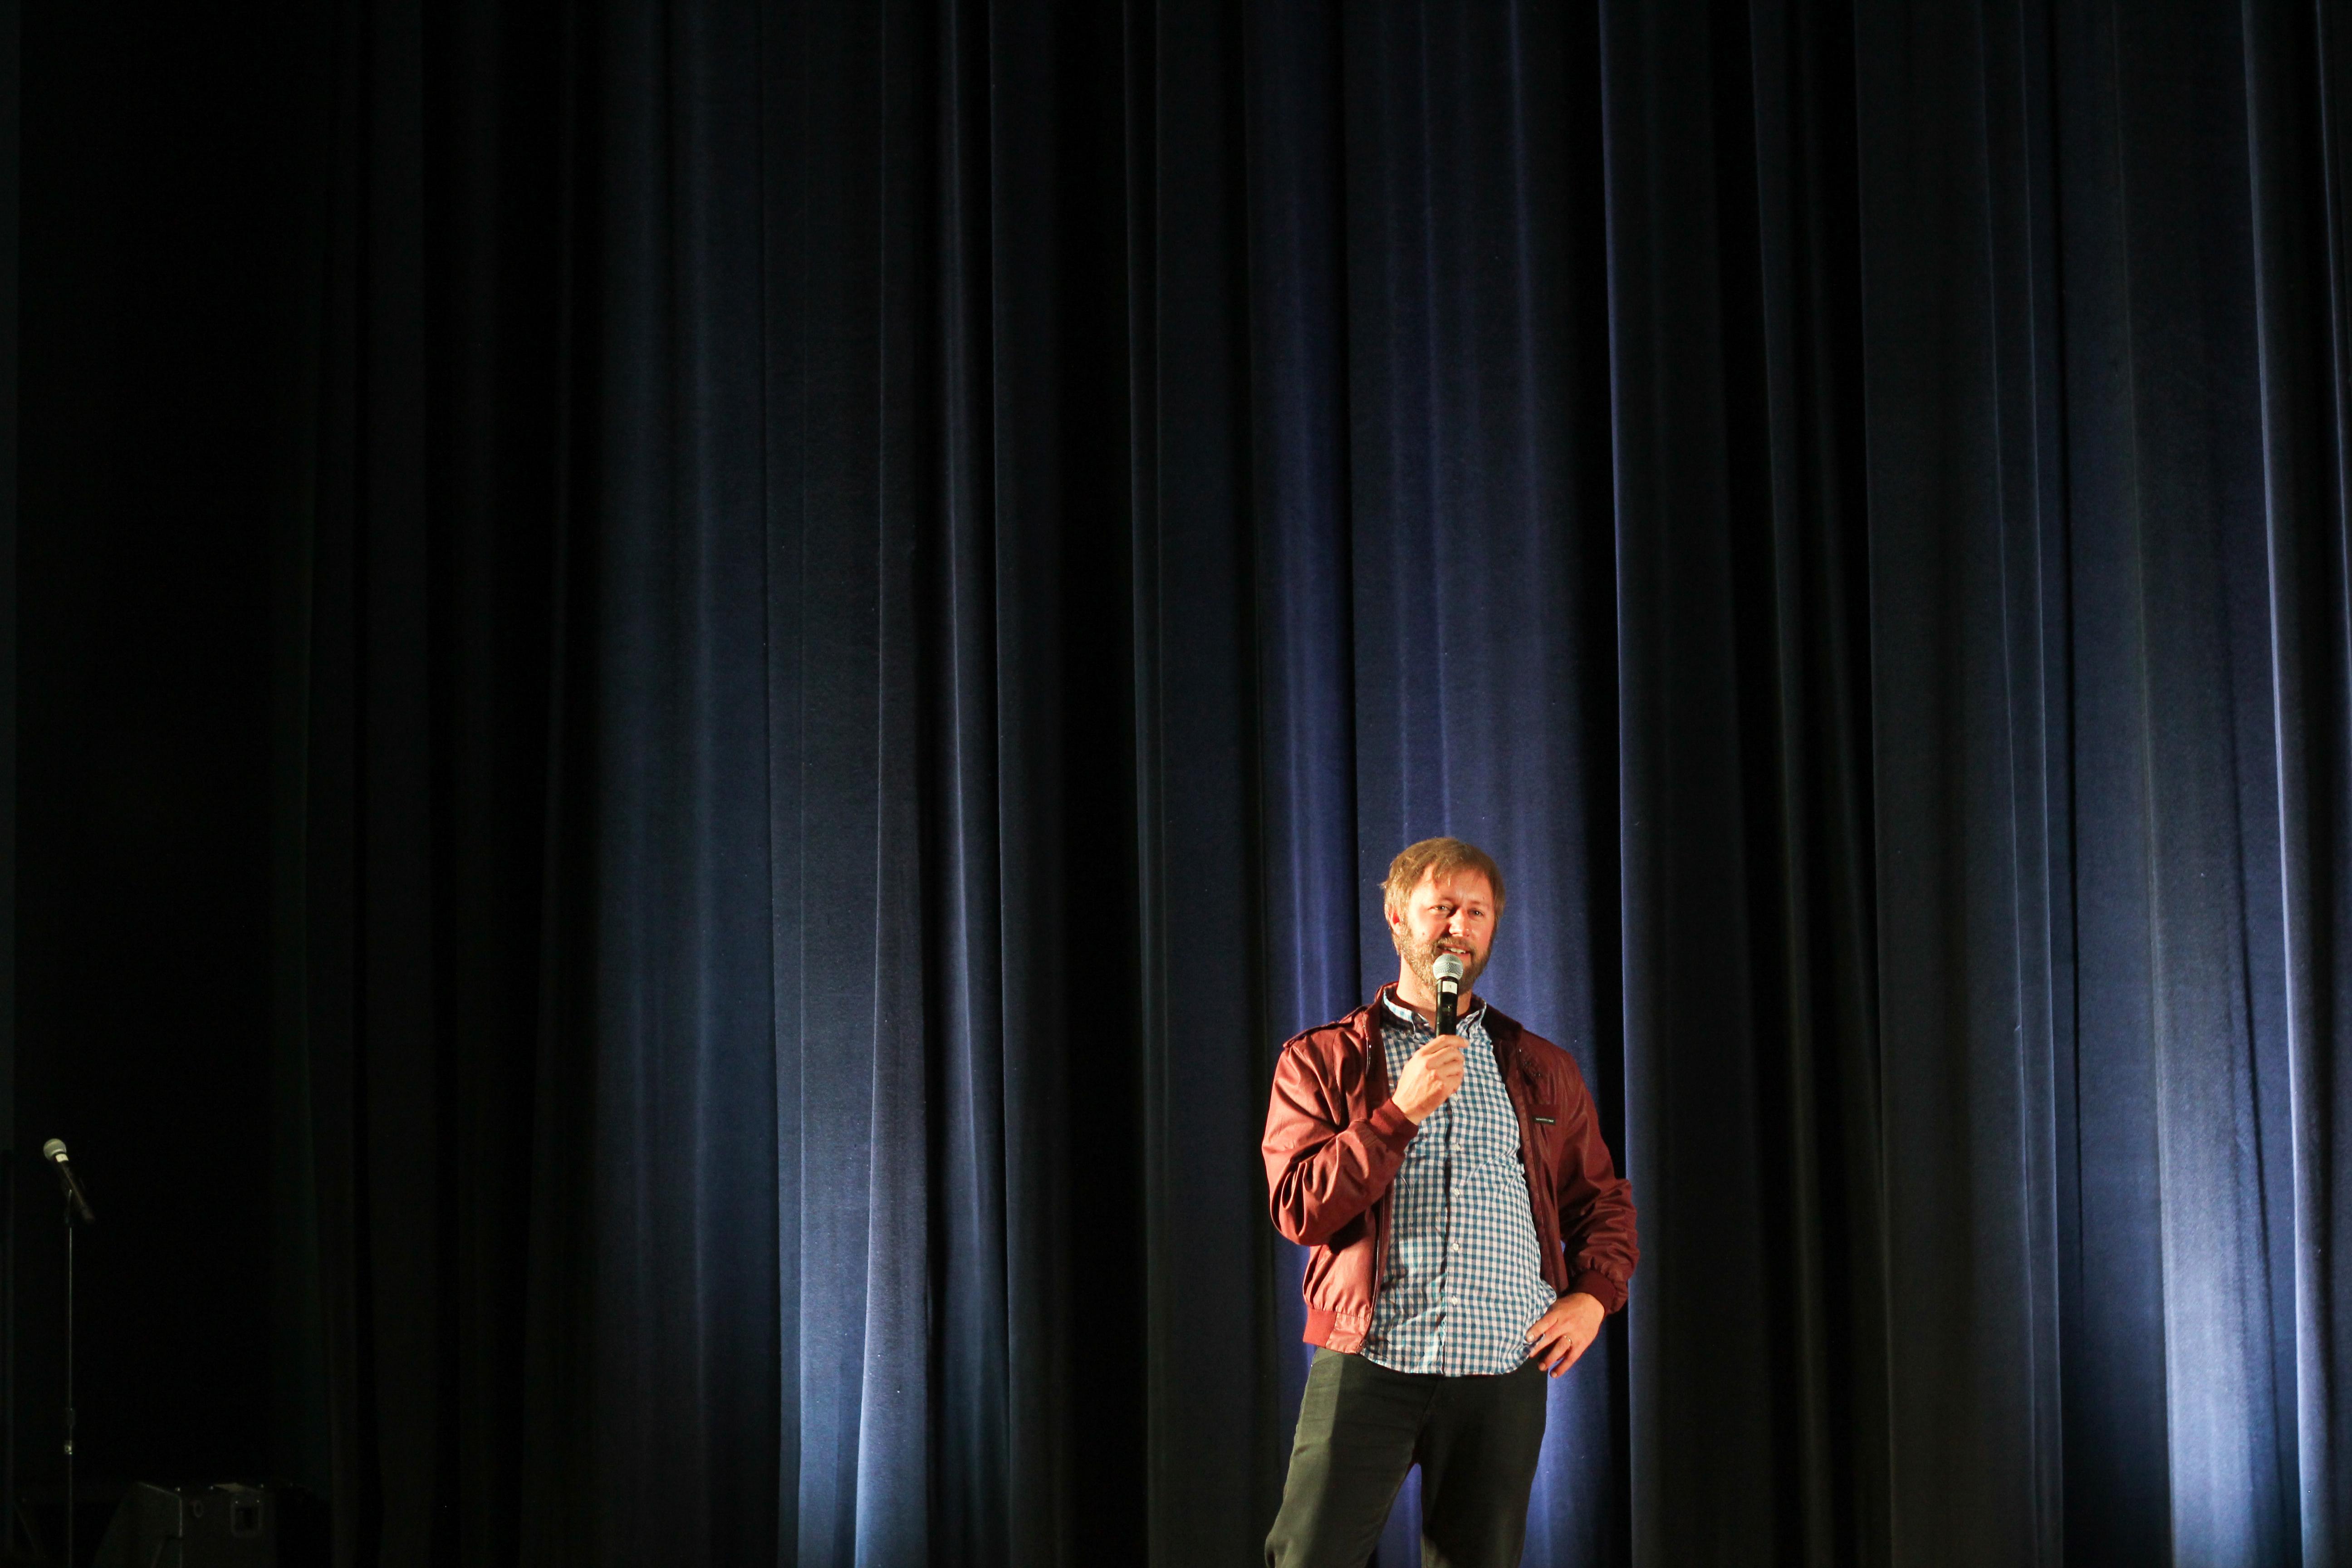 Q&A: Comedian Rory Scovel